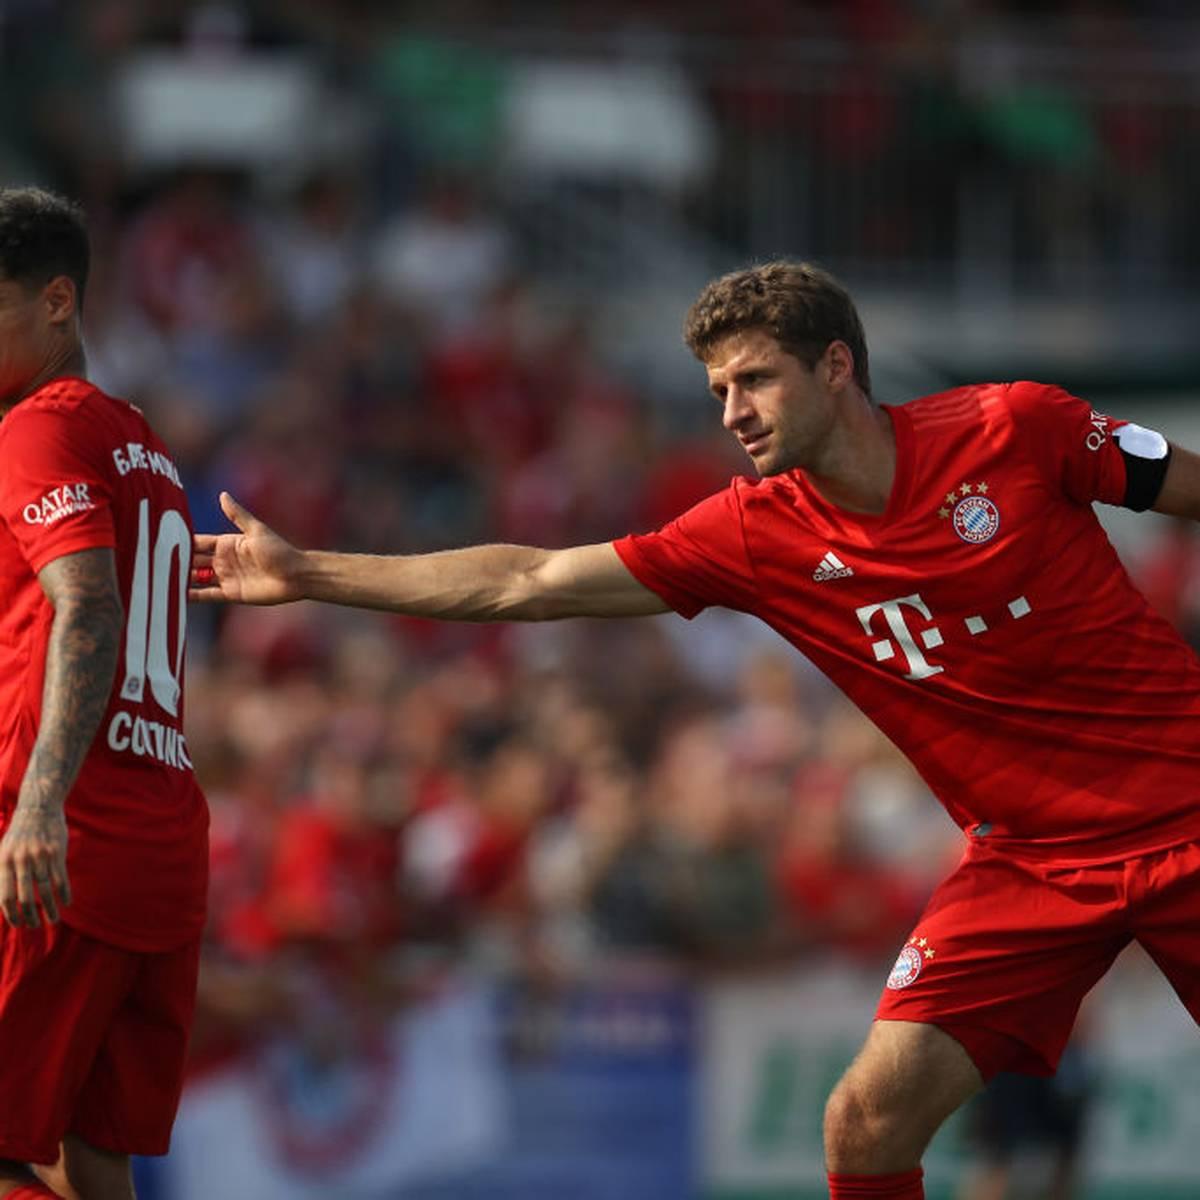 Matthäus' Meinung zu Müller/Coutinho